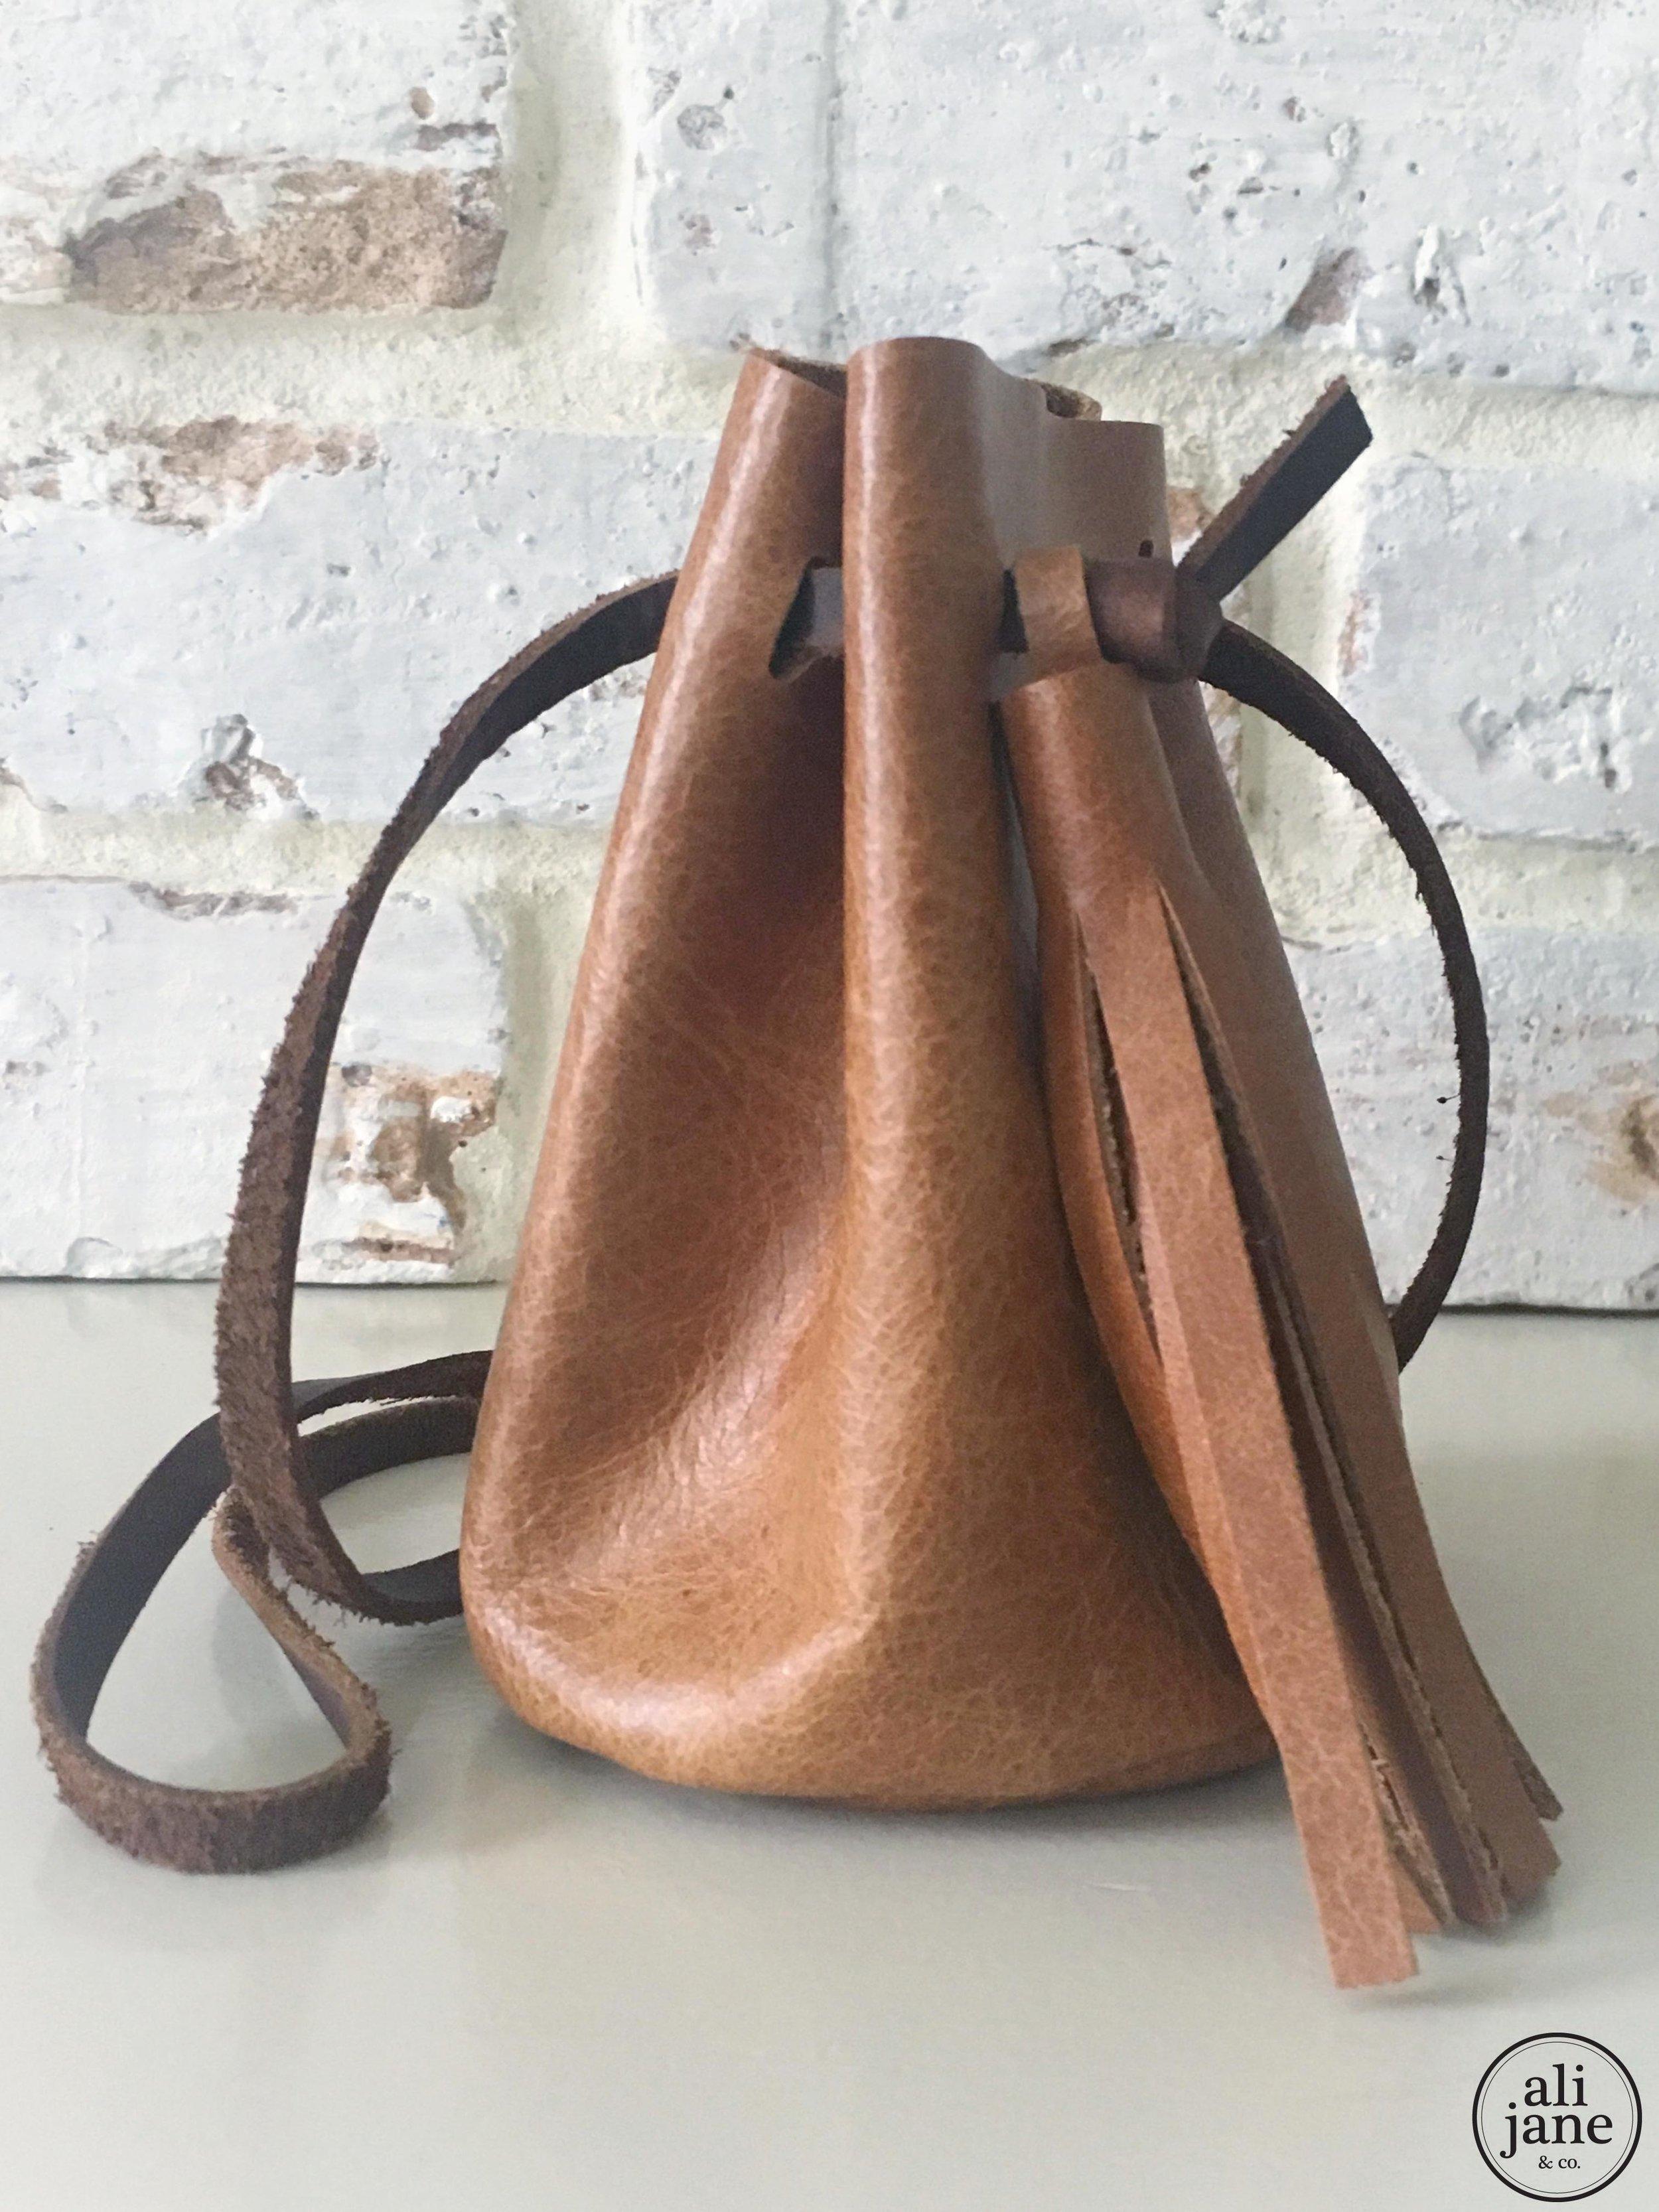 Mini tan leather pouch